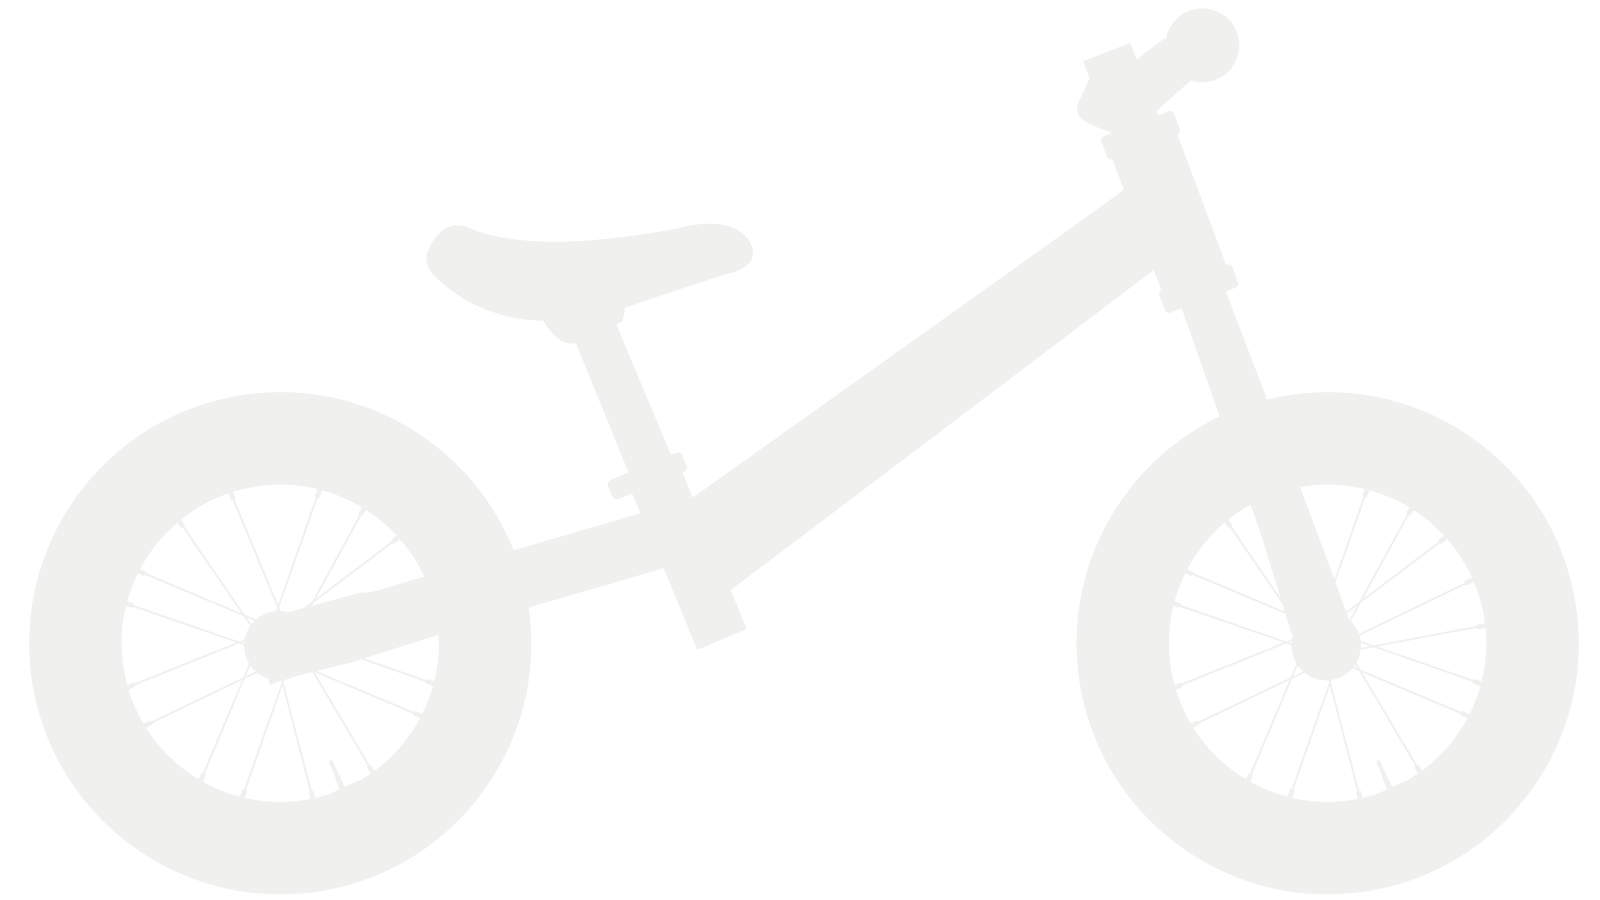 Islabikes rothan lightweight balance. Cycling clipart go ahead